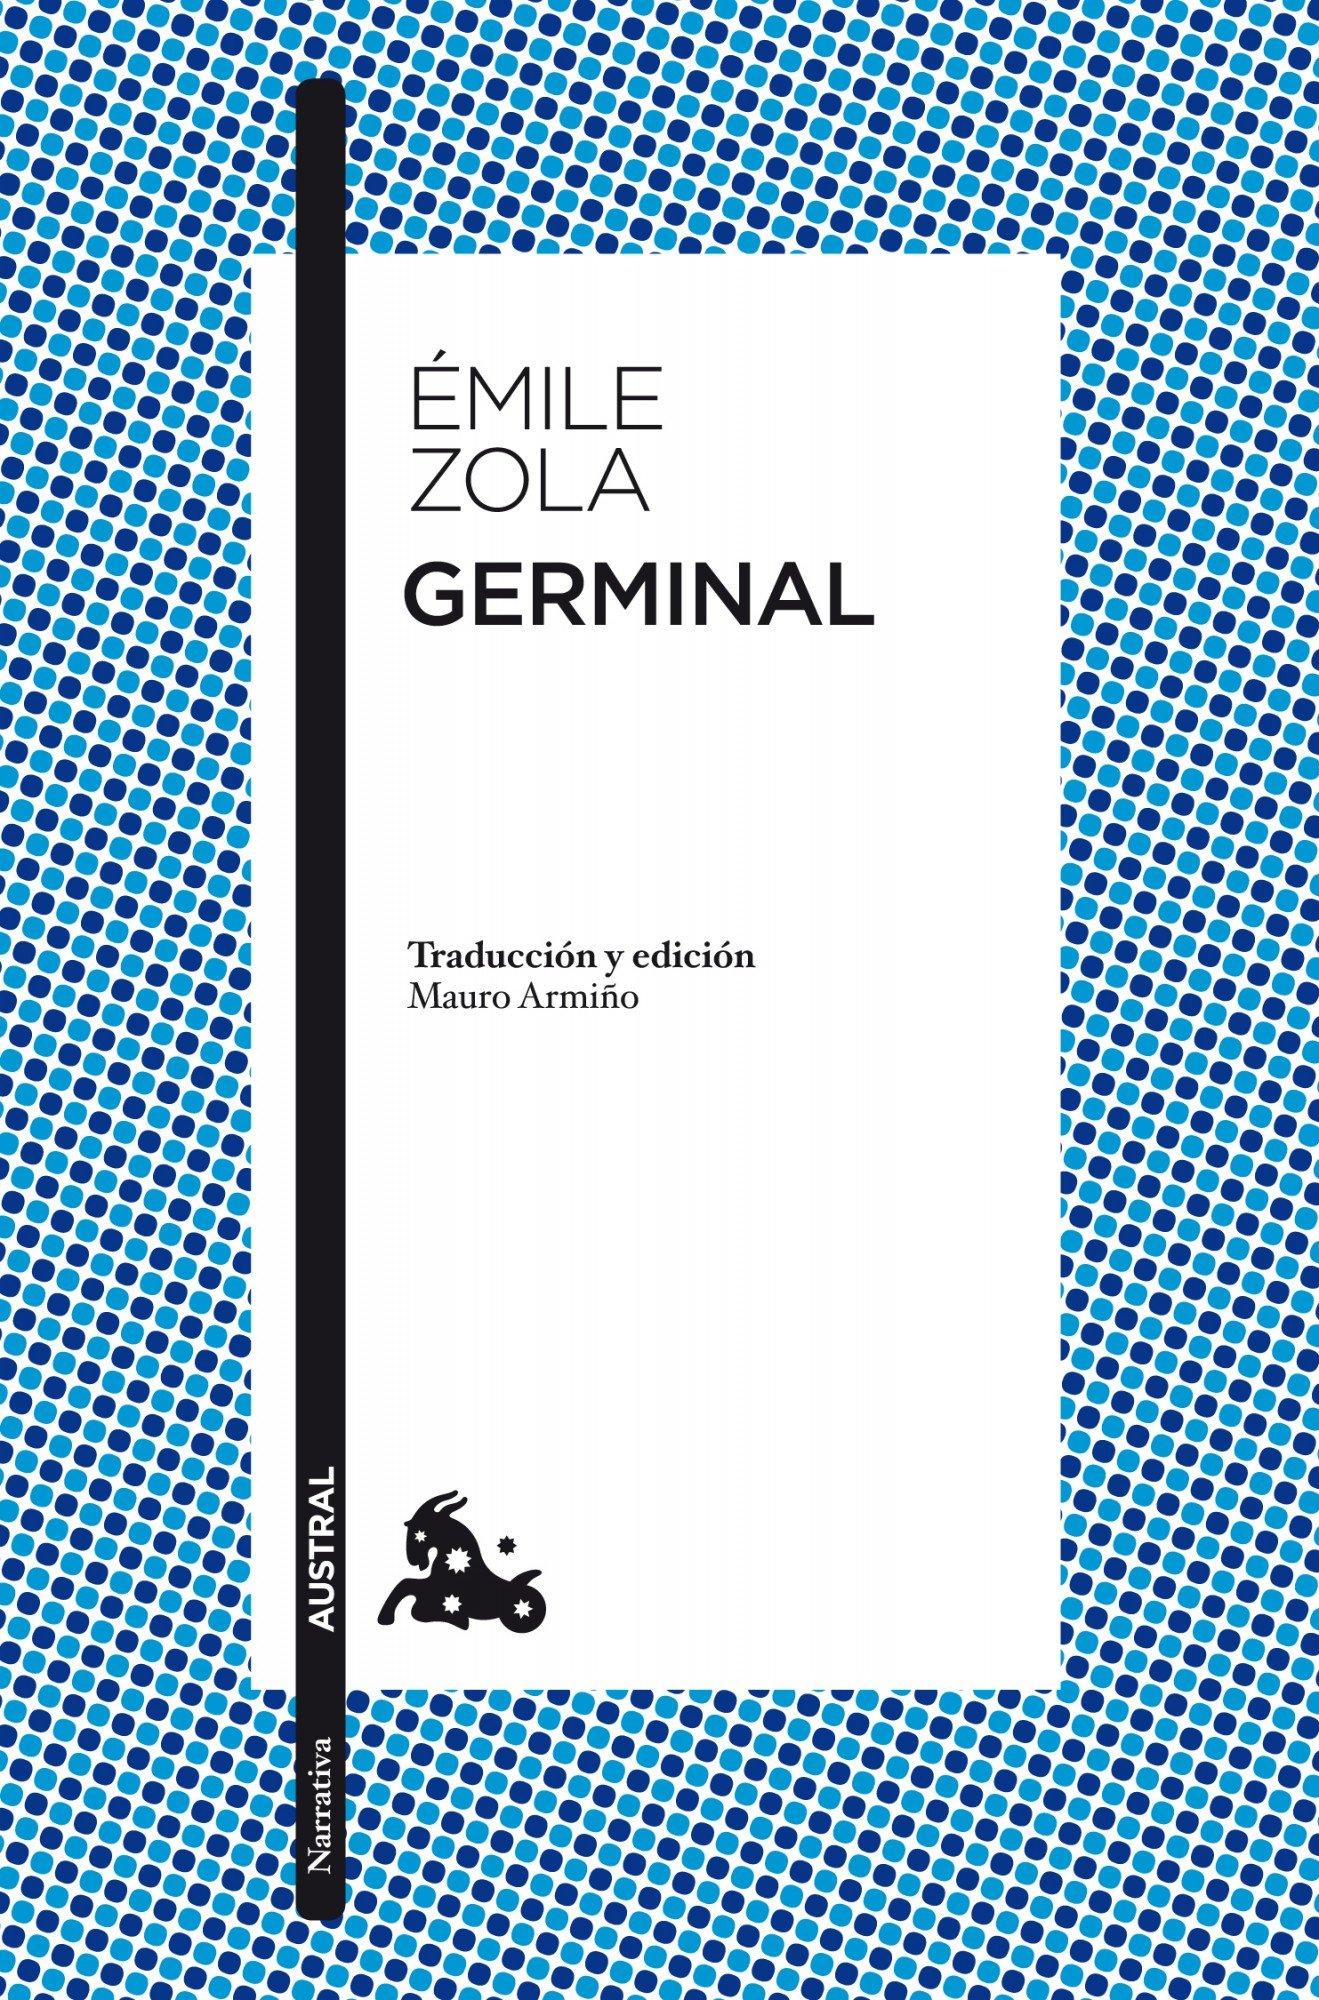 GERMINAL(9788467034035) (Narrativa, Band 2)